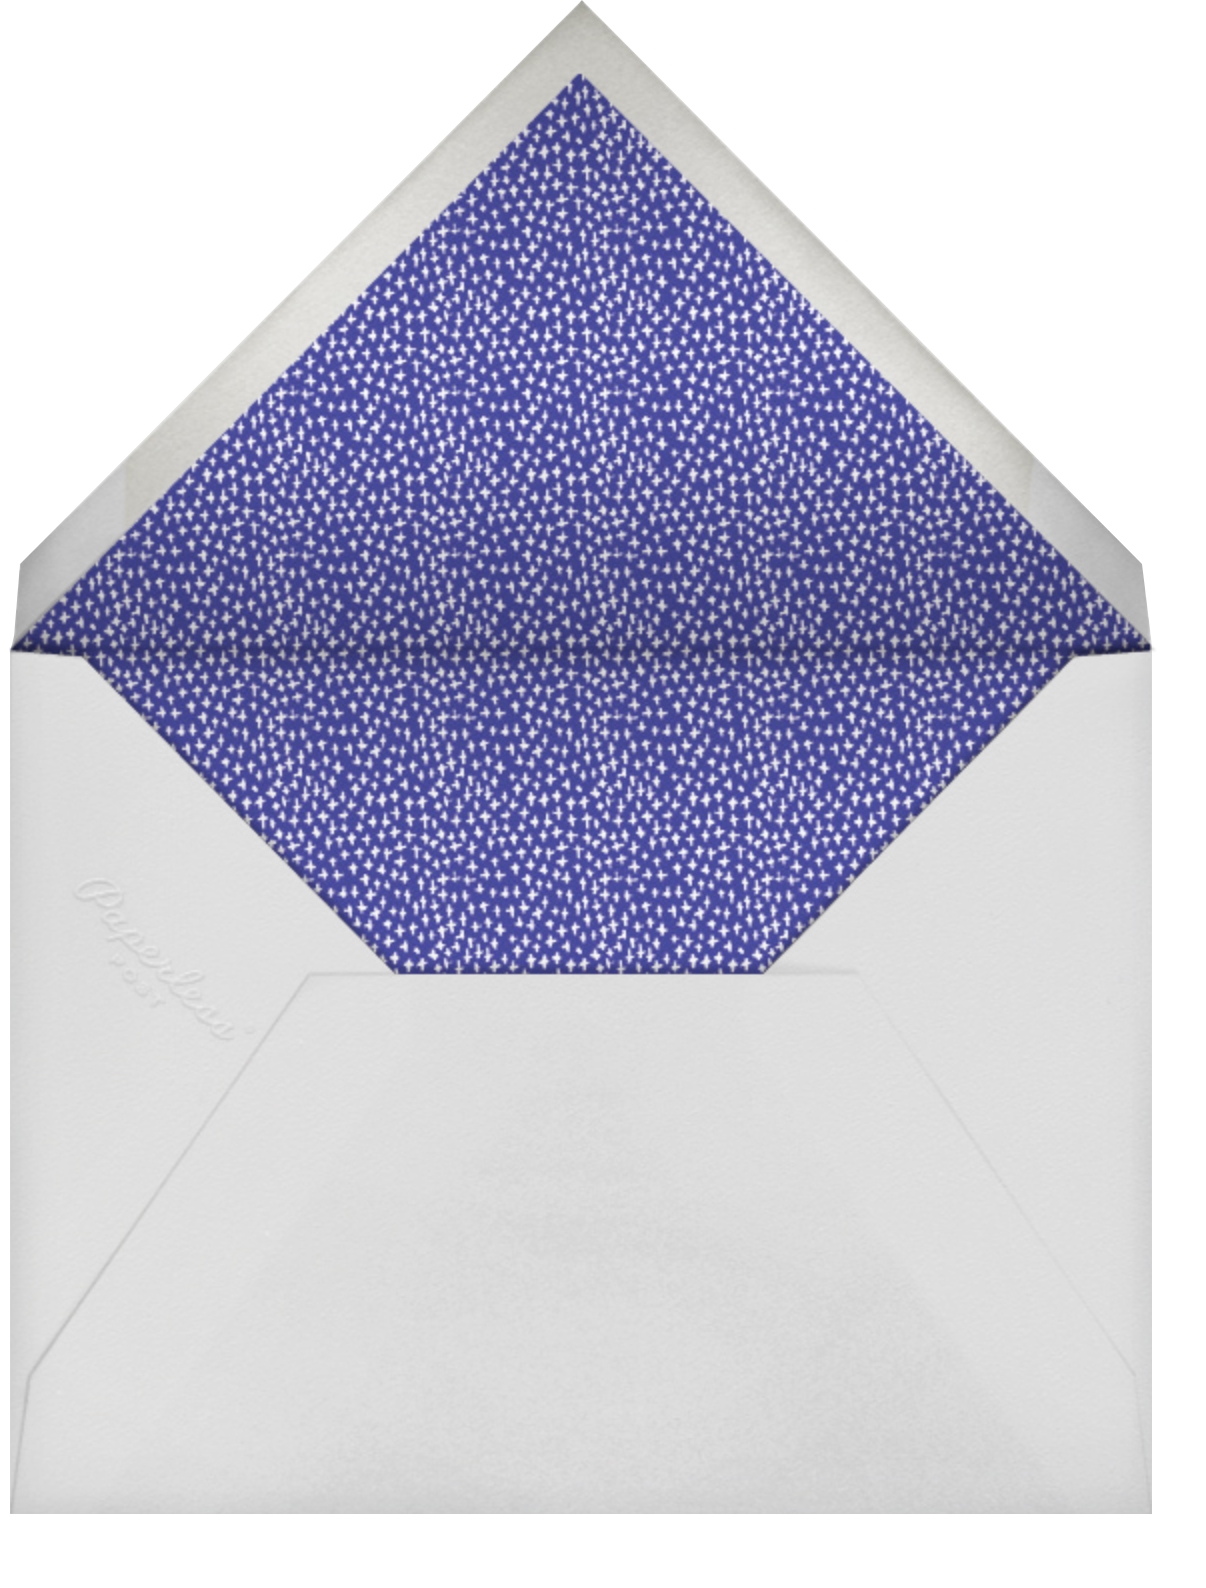 Penciled Garden - Mr. Boddington's Studio - Baby shower - envelope back